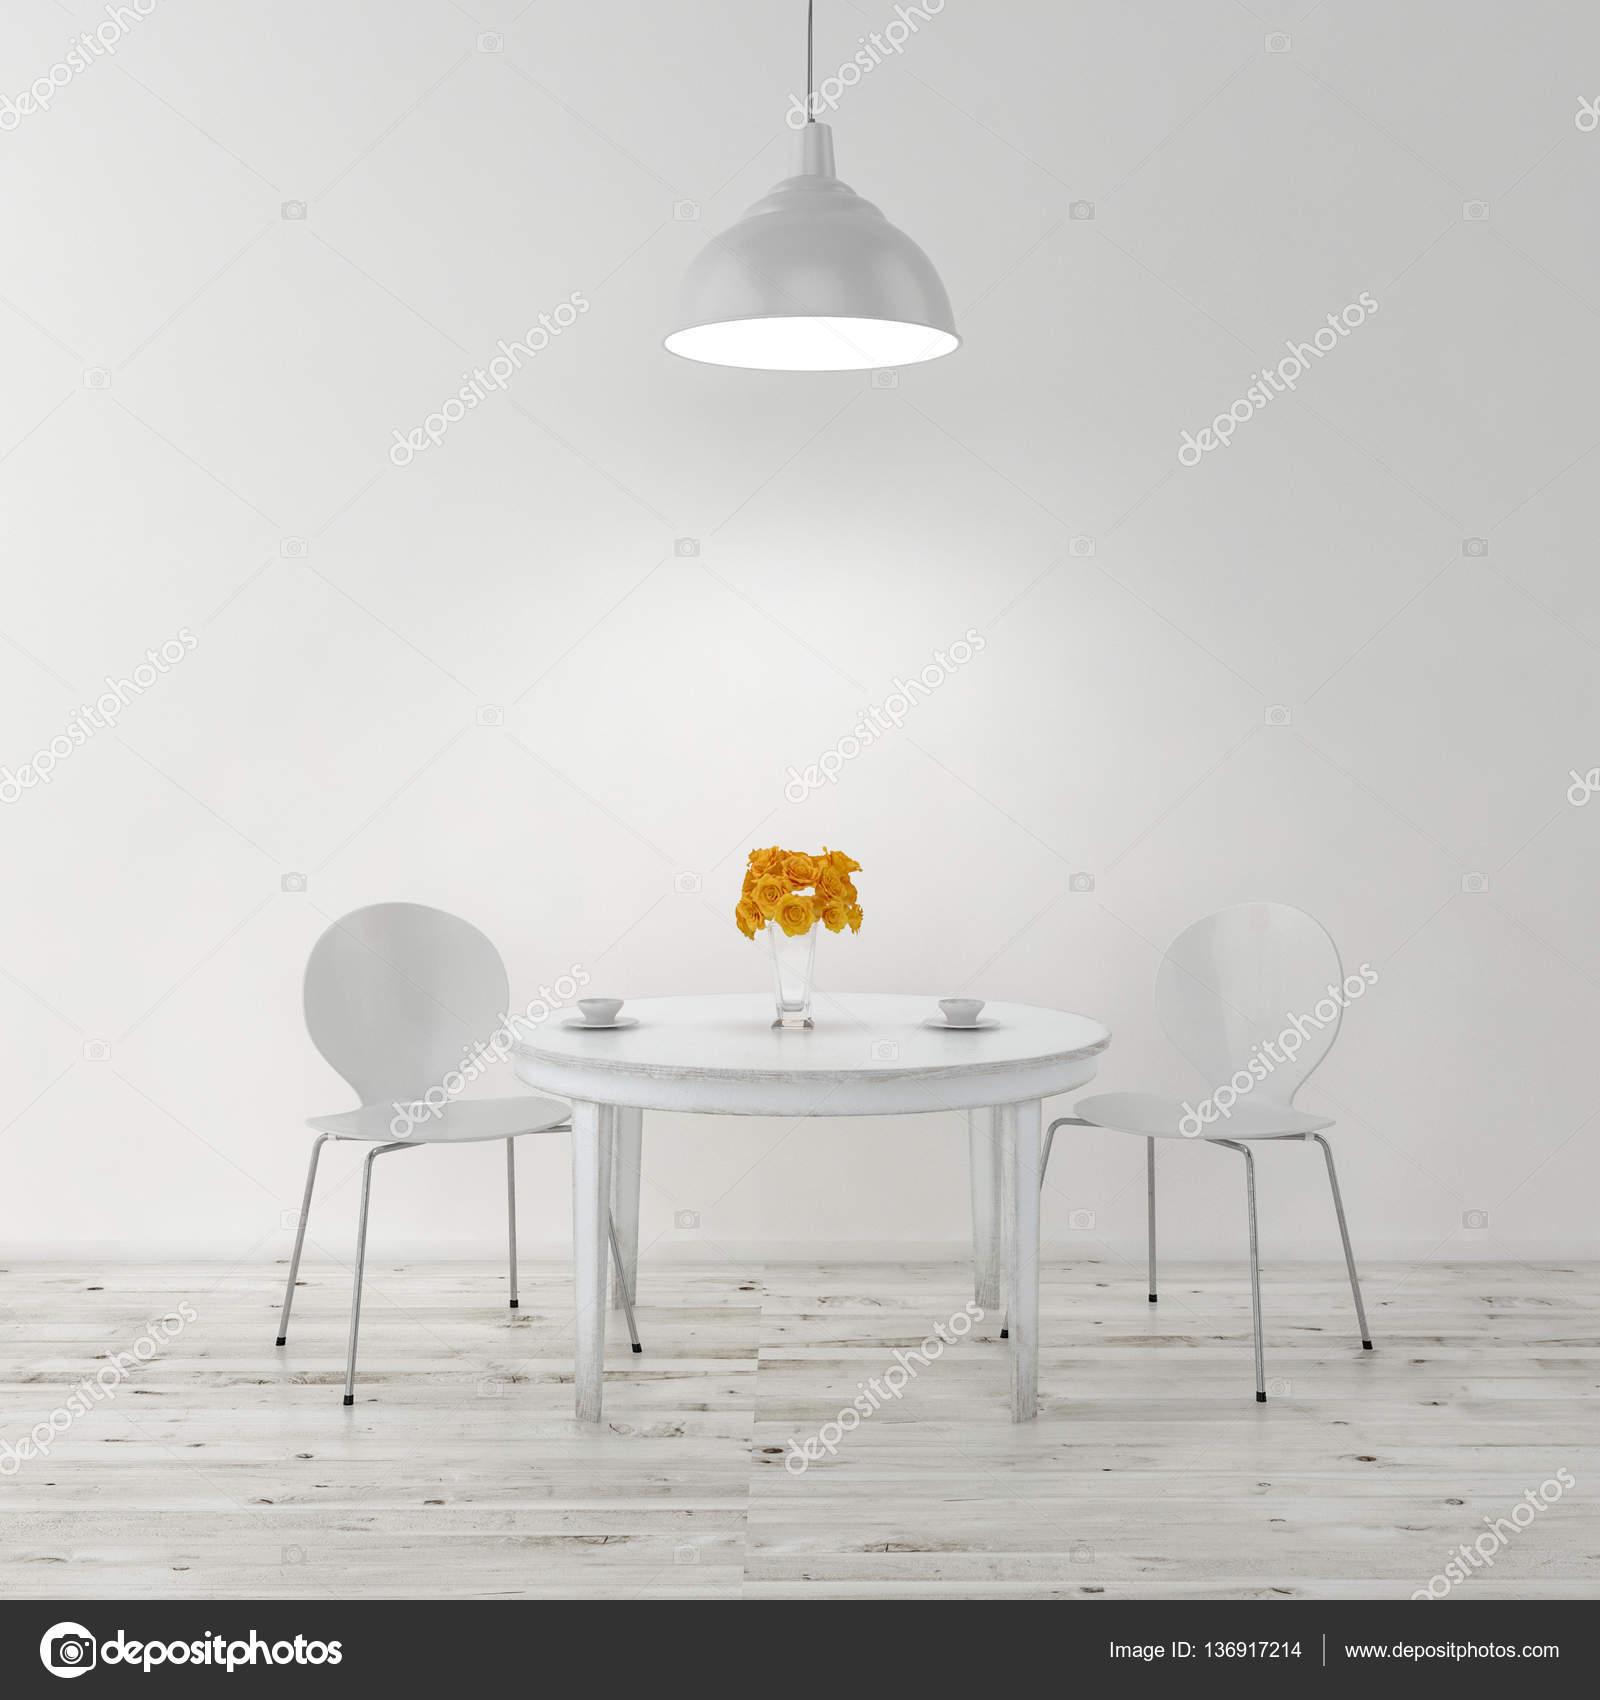 chairs for kitchen table commercial fan extractor 厨房的桌子和椅子 图库照片 c pozitivo 136917214 厨房桌子和椅子 3d 图 照片作者pozitivo